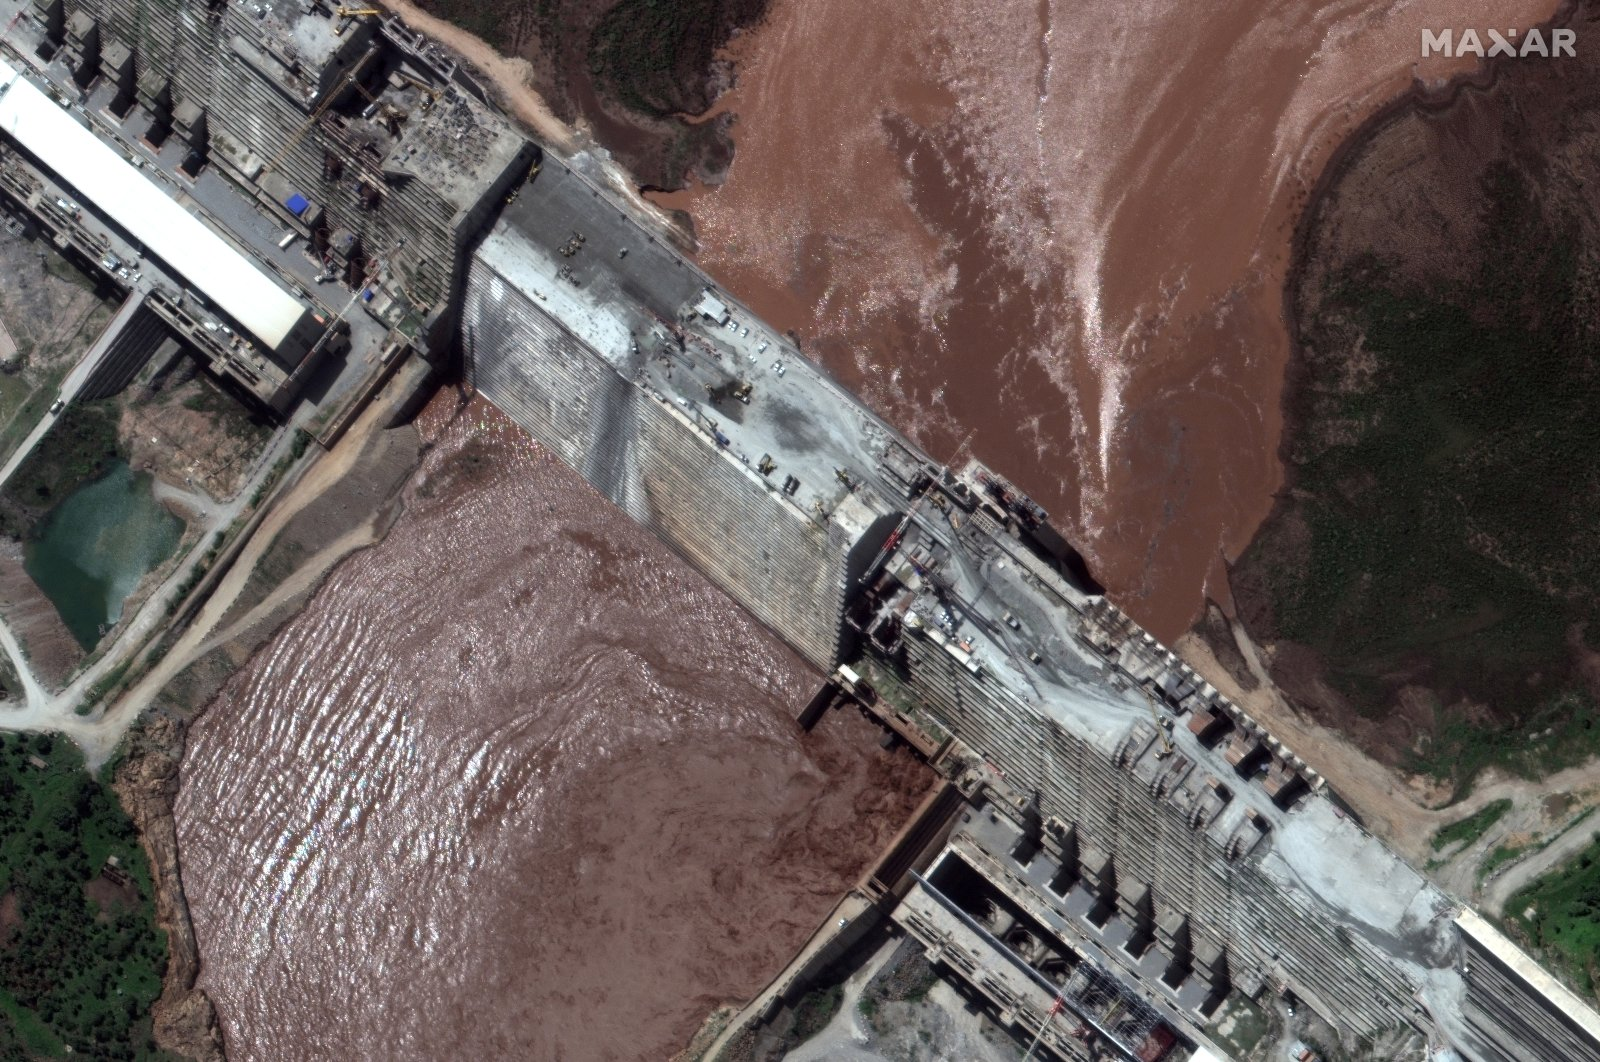 A handout satellite image shows a closeup view of the Grand Ethiopian Renaissance Dam (GERD) and the Blue Nile River, Ethiopia, June 26, 2020. (REUTERS Photo)